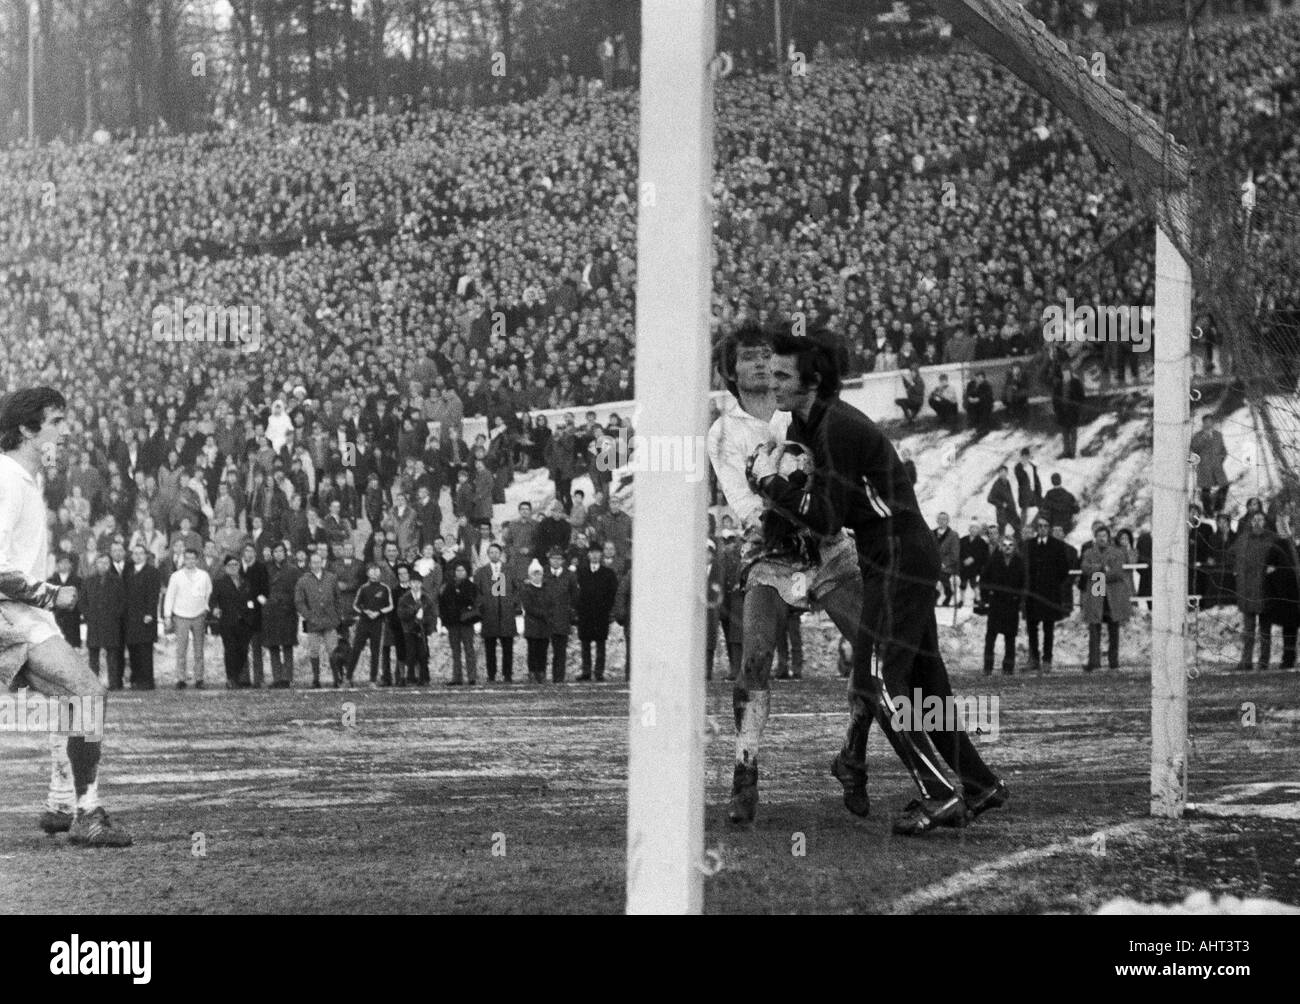 football, Regionalliga West, 1970/1971, Stadium am Zoo in Wuppertal, Wuppertaler SV versus Fortuna Duesseldorf 1:1, scene of the match, f.l.t.r. Gustav Jung (WSV), Guenter Proepper (WSV), keeper Bernd Franke (Ddorf) - Stock Image